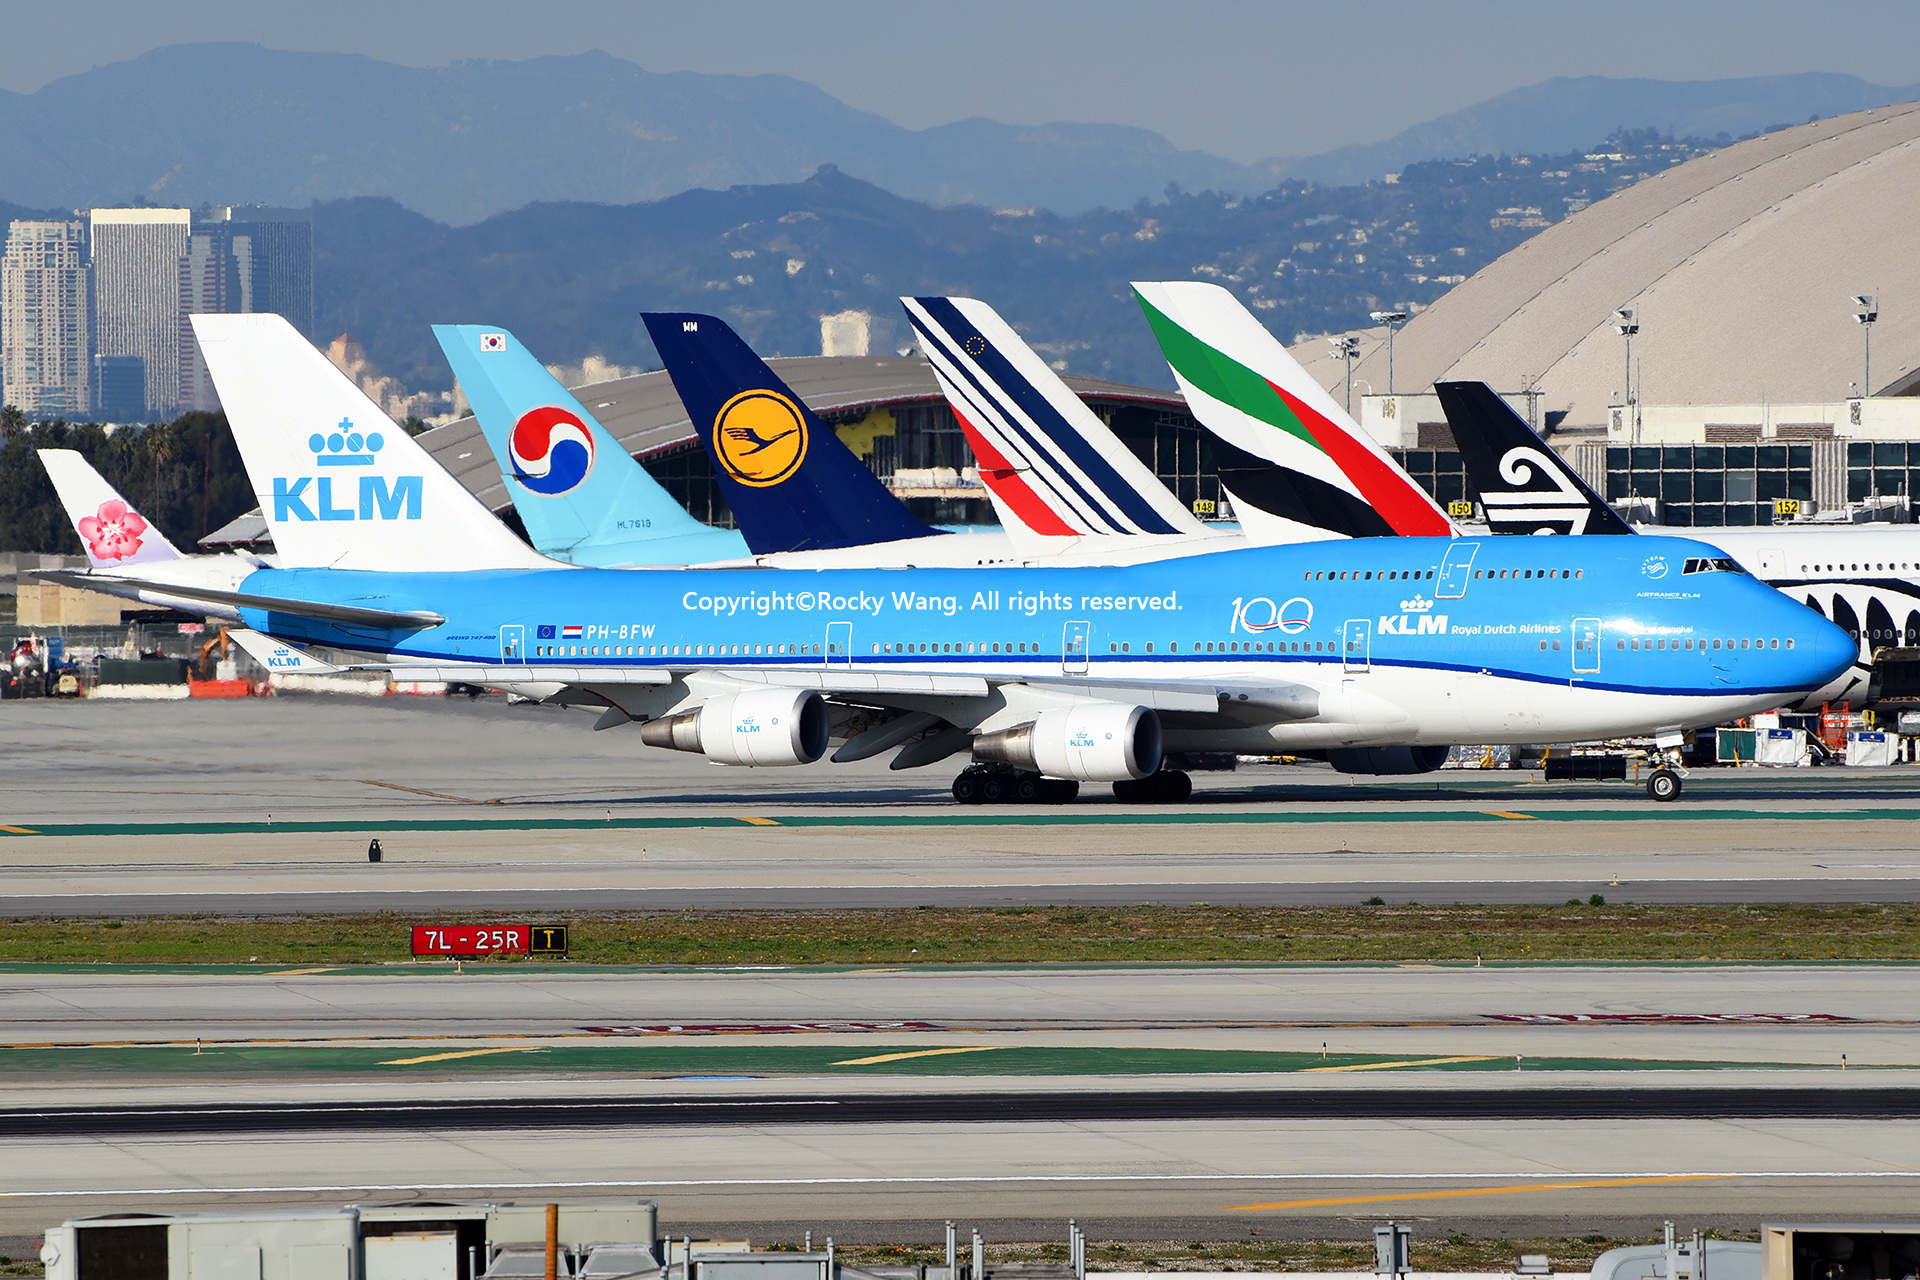 Re:[原创]随便来一组 不凑30图了 BOEING 747-406(M) PH-BFW Los Angeles Int'l Airport